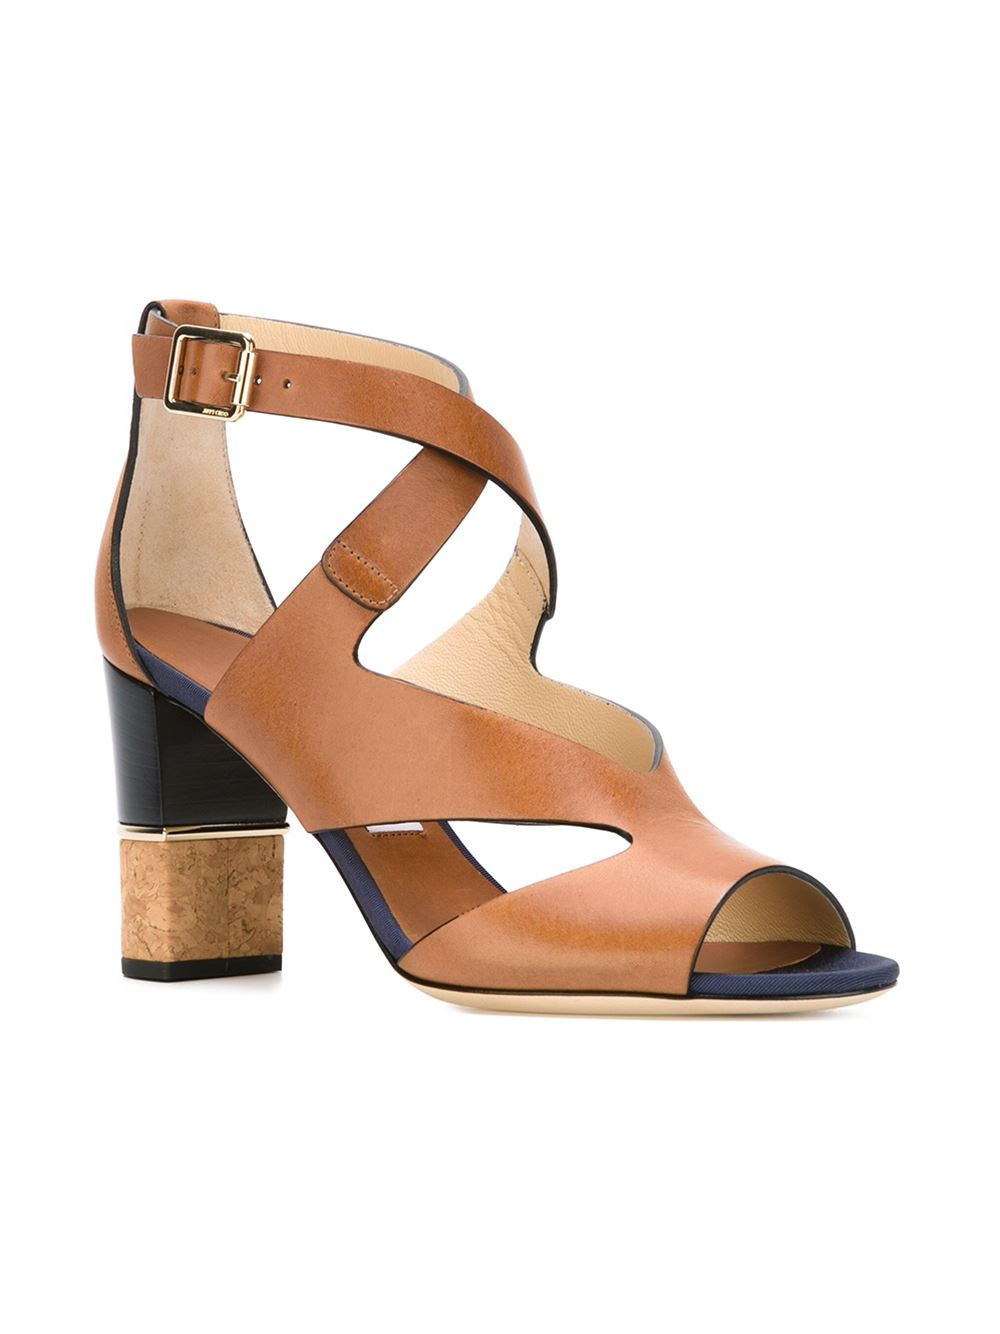 Jimmy choo 'mira' Sandals in Brown